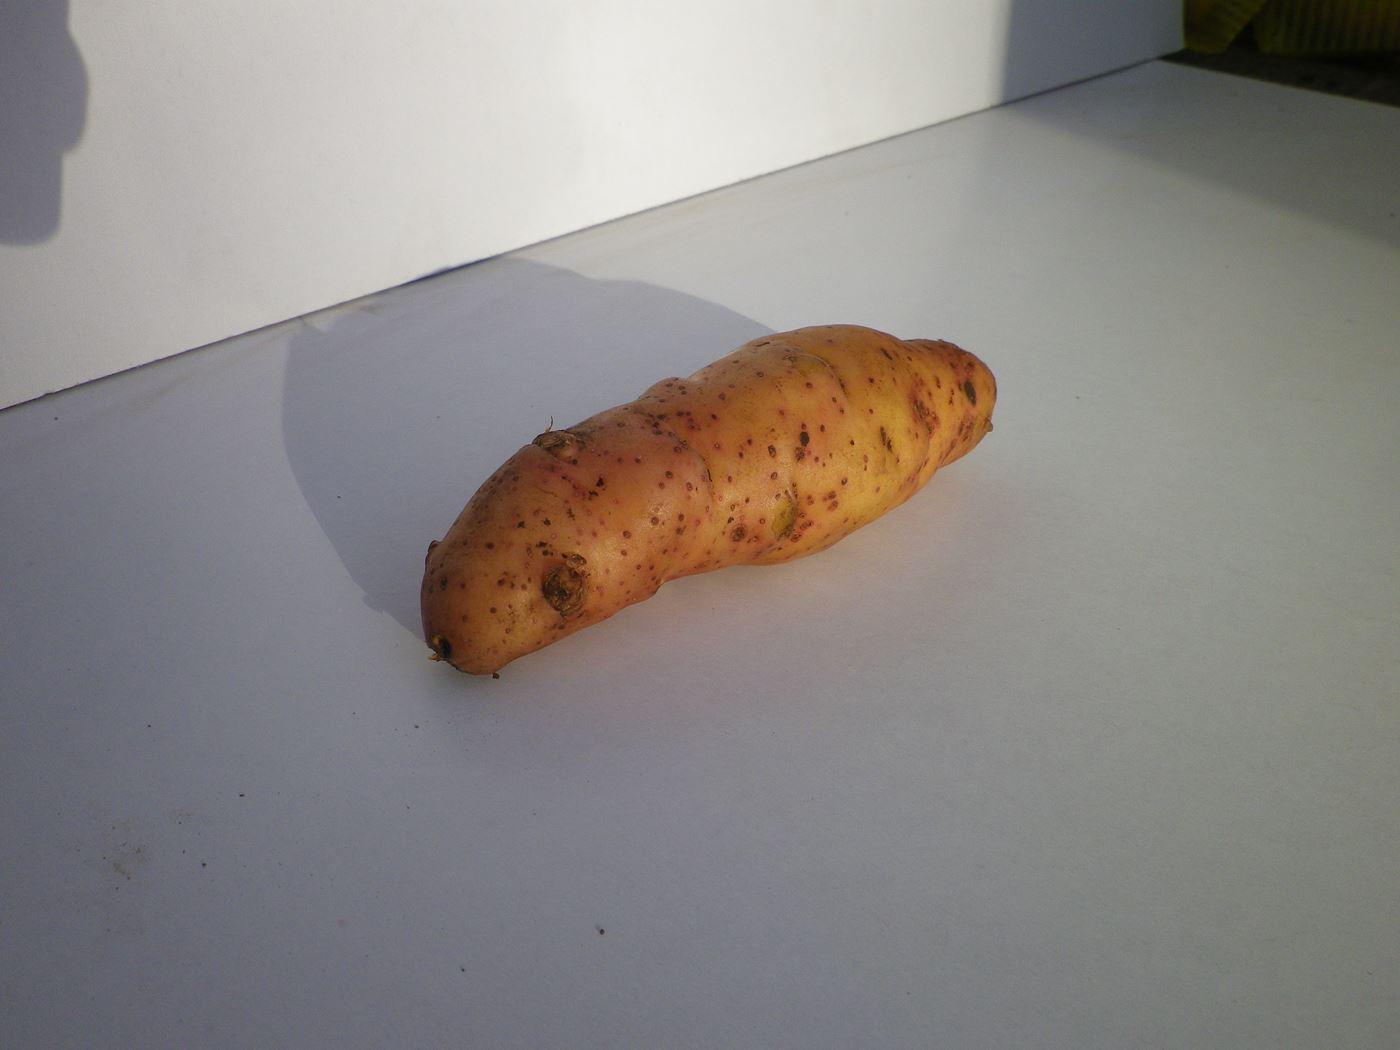 debaere pootaardappel corne de gatte ecosse (25/35mm)